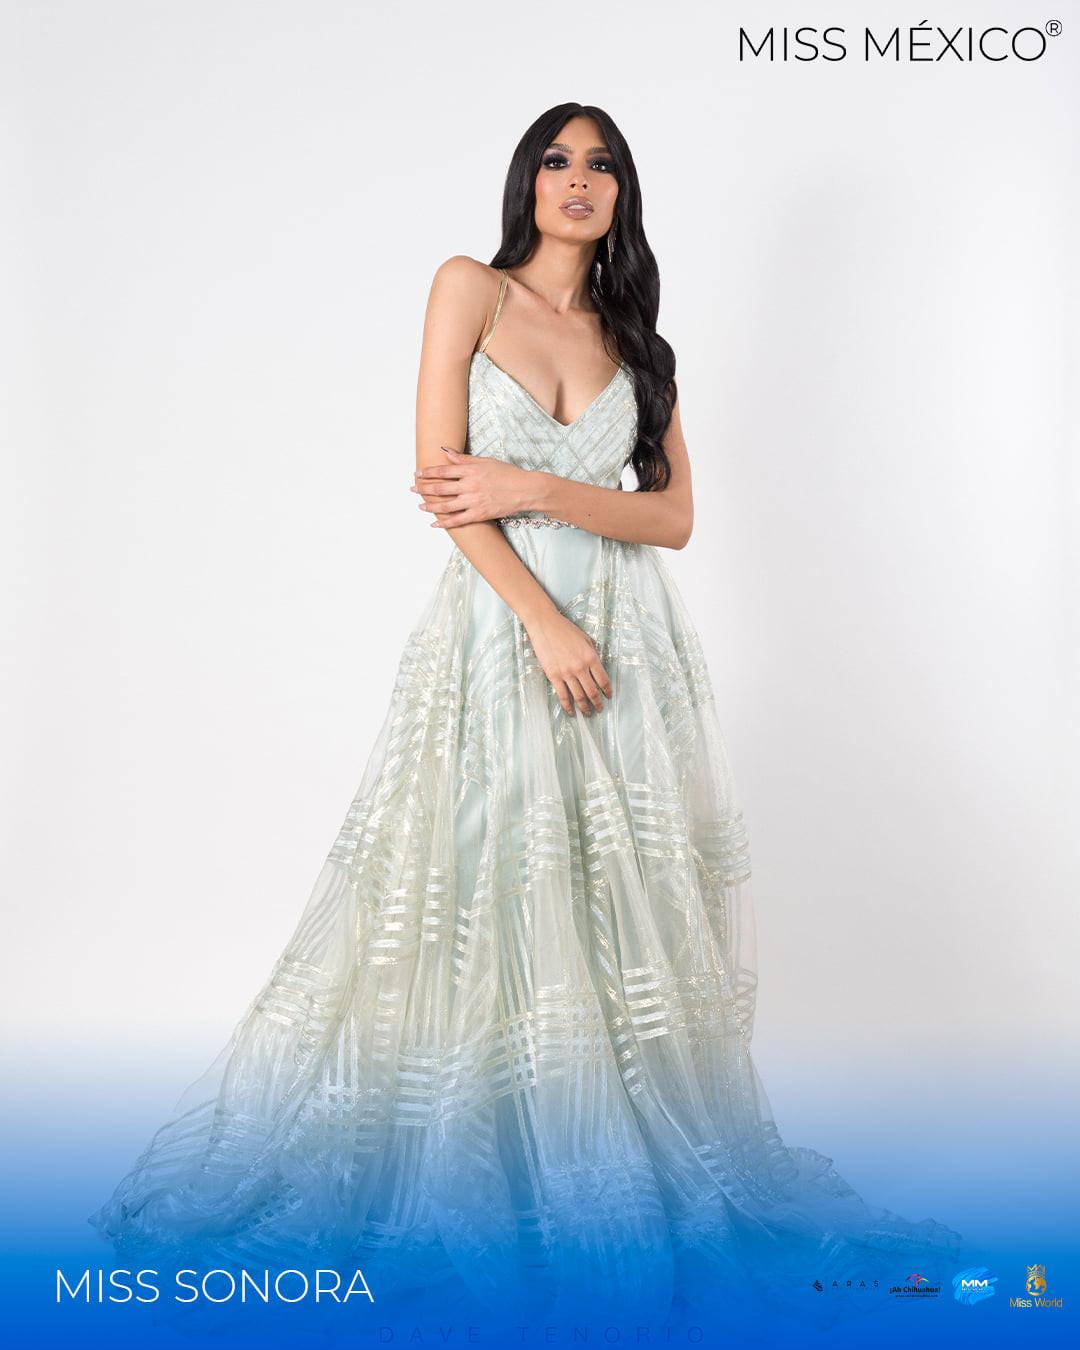 candidatas a miss mexico 2021, final: 3 july. - Página 13 Bm7Ul4